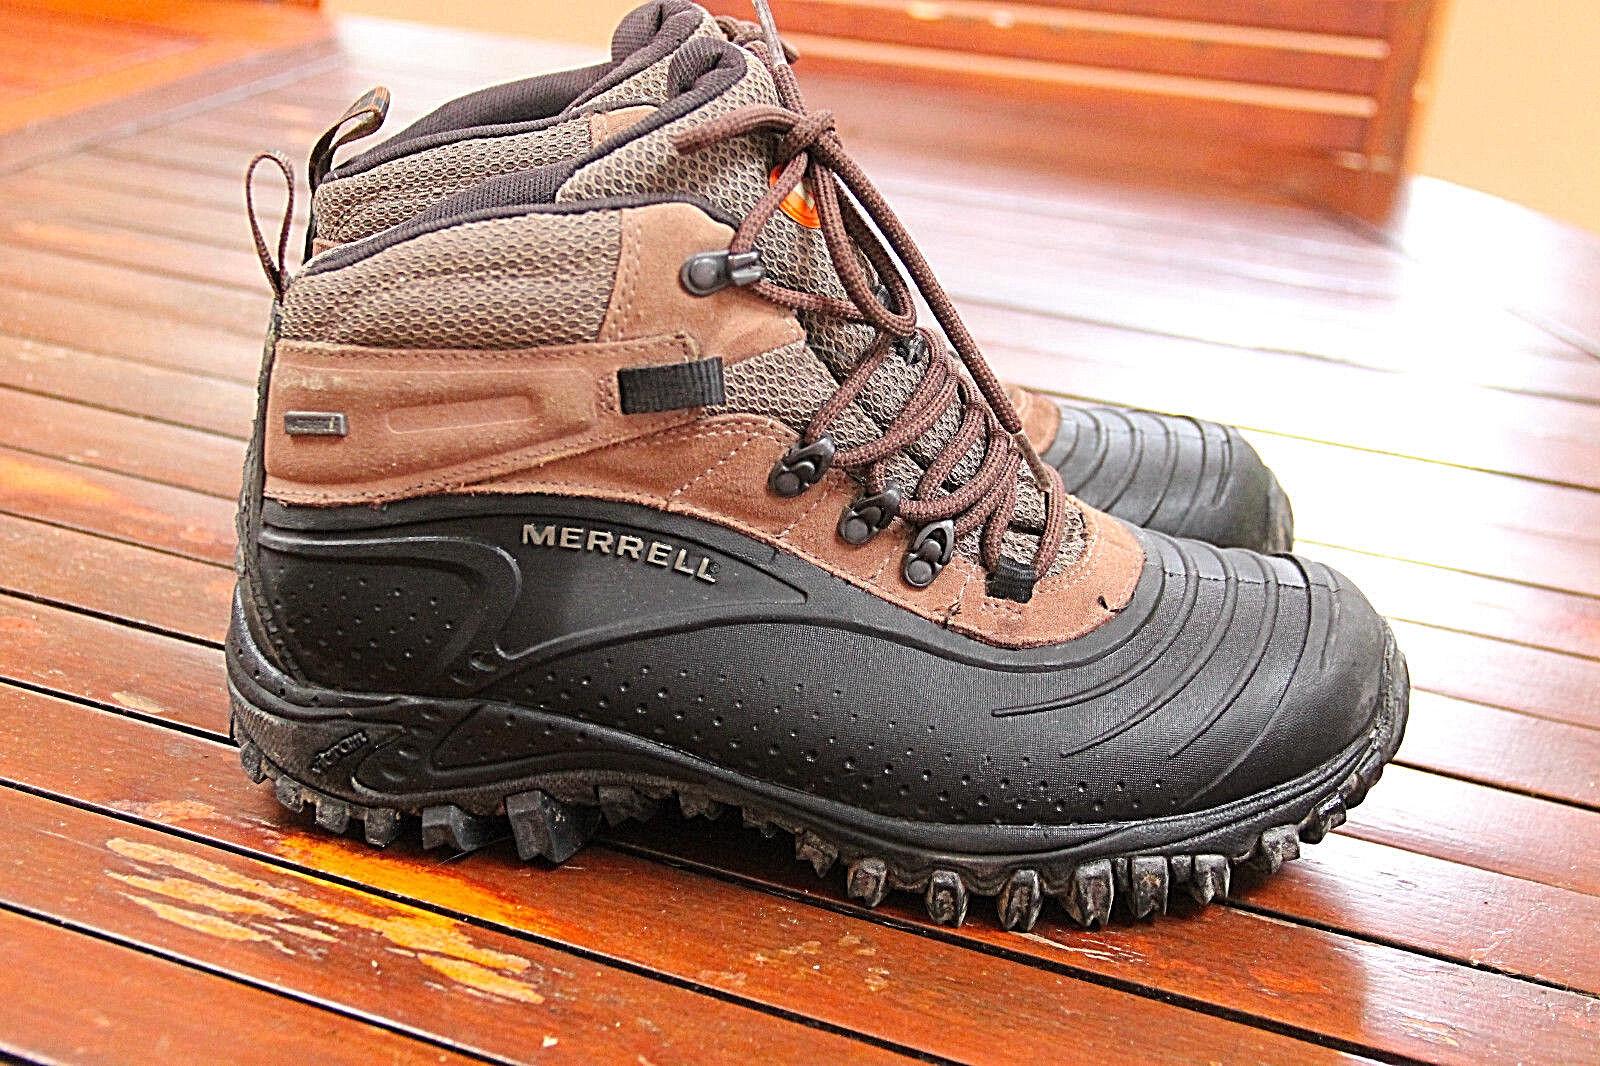 Magníficos zapatos senderismo trek resistente al agua MERELL MERELL MERELL p 42 EU UK8 valor 72b3a5